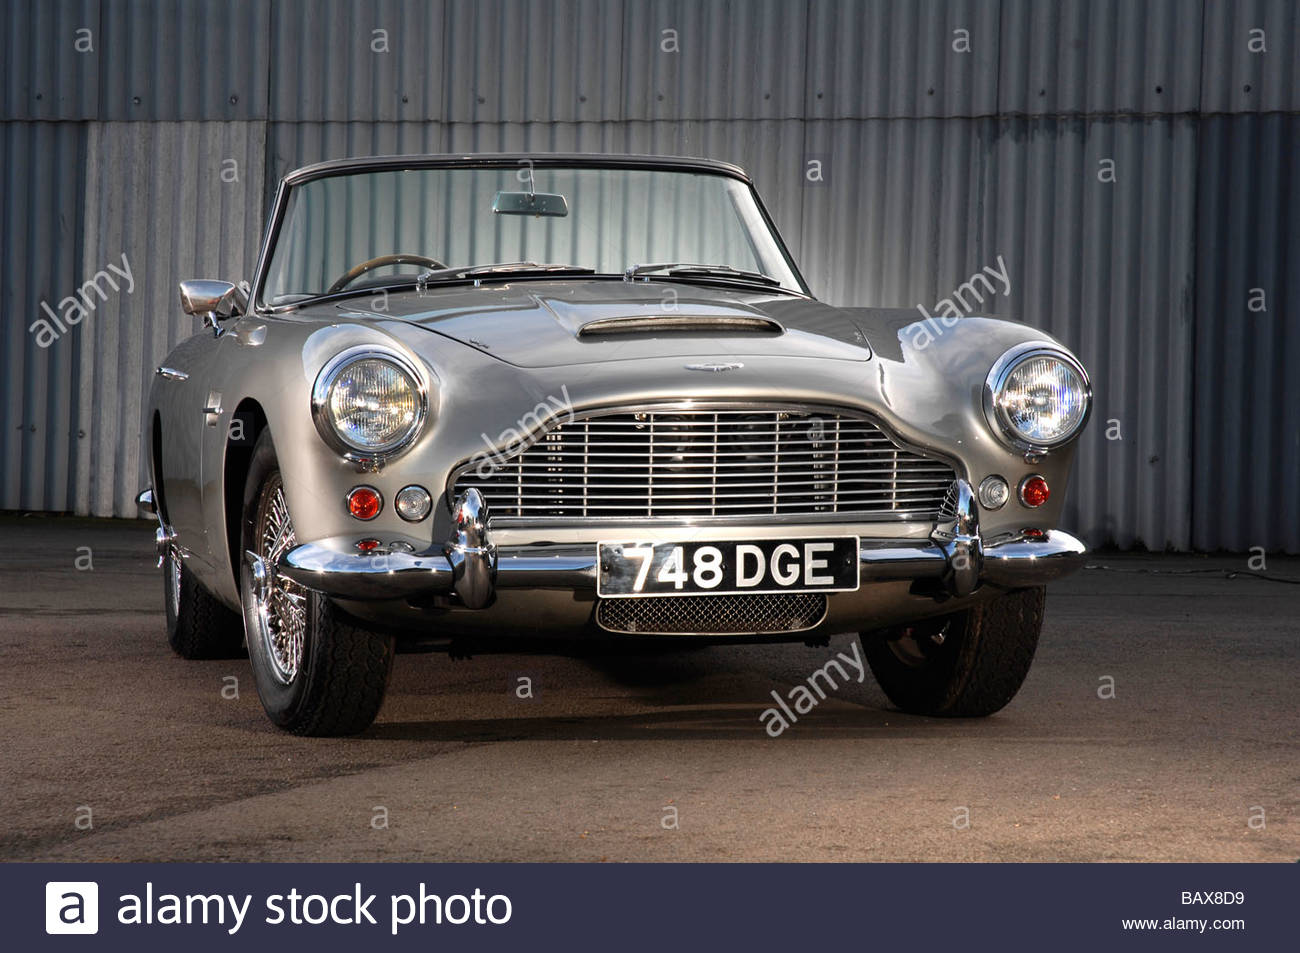 Aston Martin DB4 Cabrio Stockbild